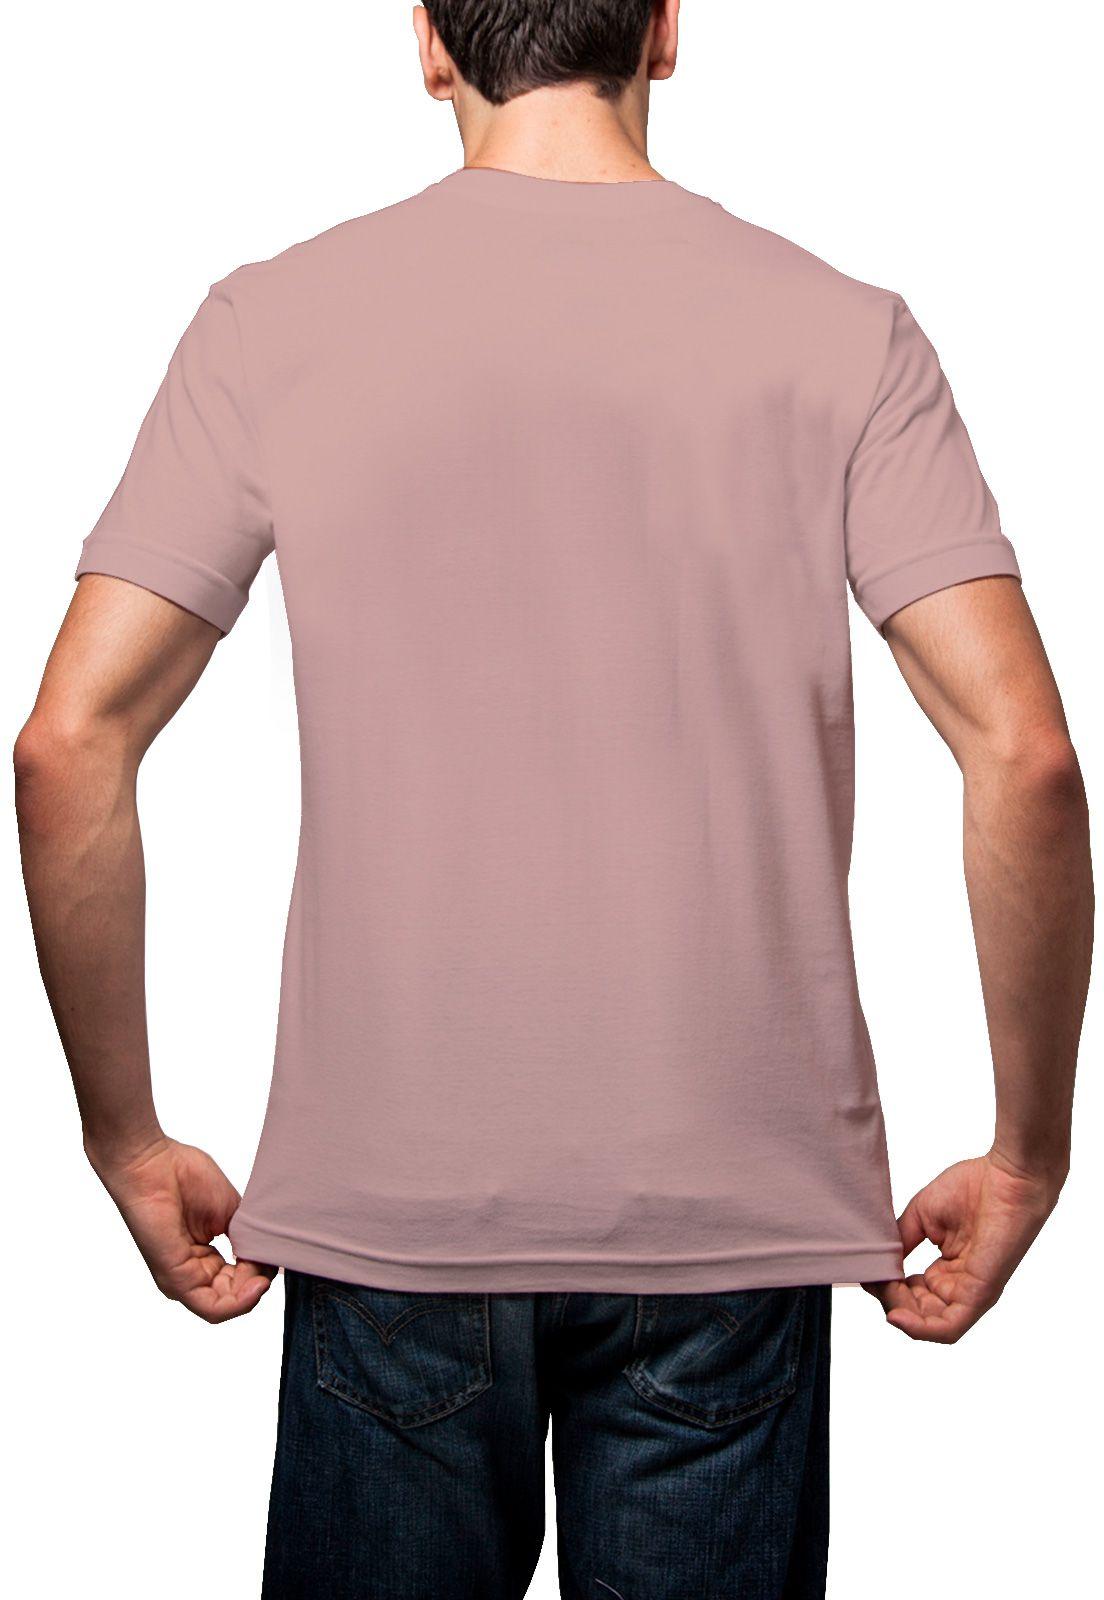 Camiseta Amazônia Básica Árvore Bordada Gola V - Rosa Claro